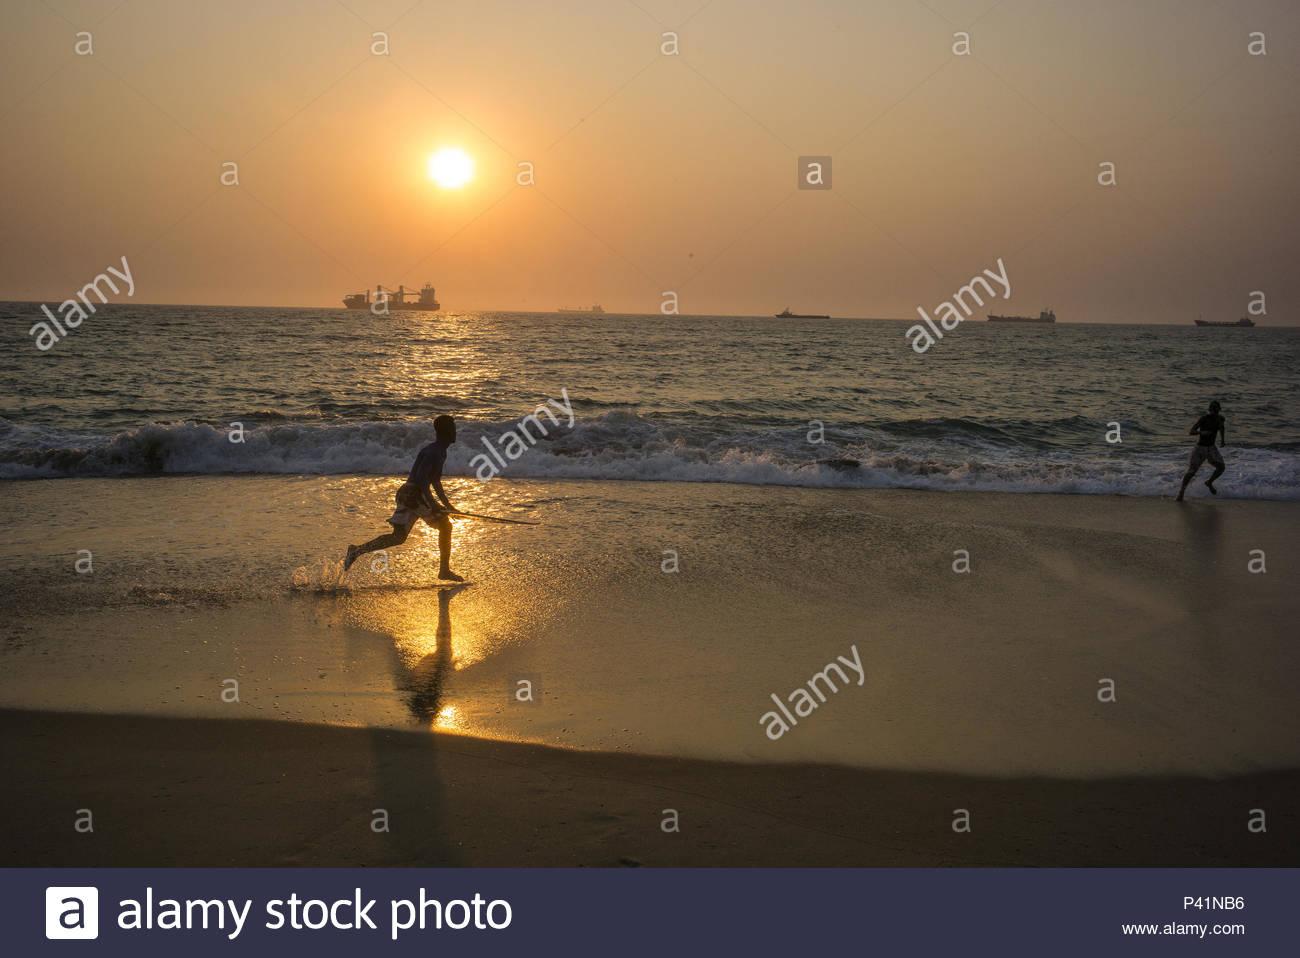 A man runs along the coastline in Angola. - Stock Image